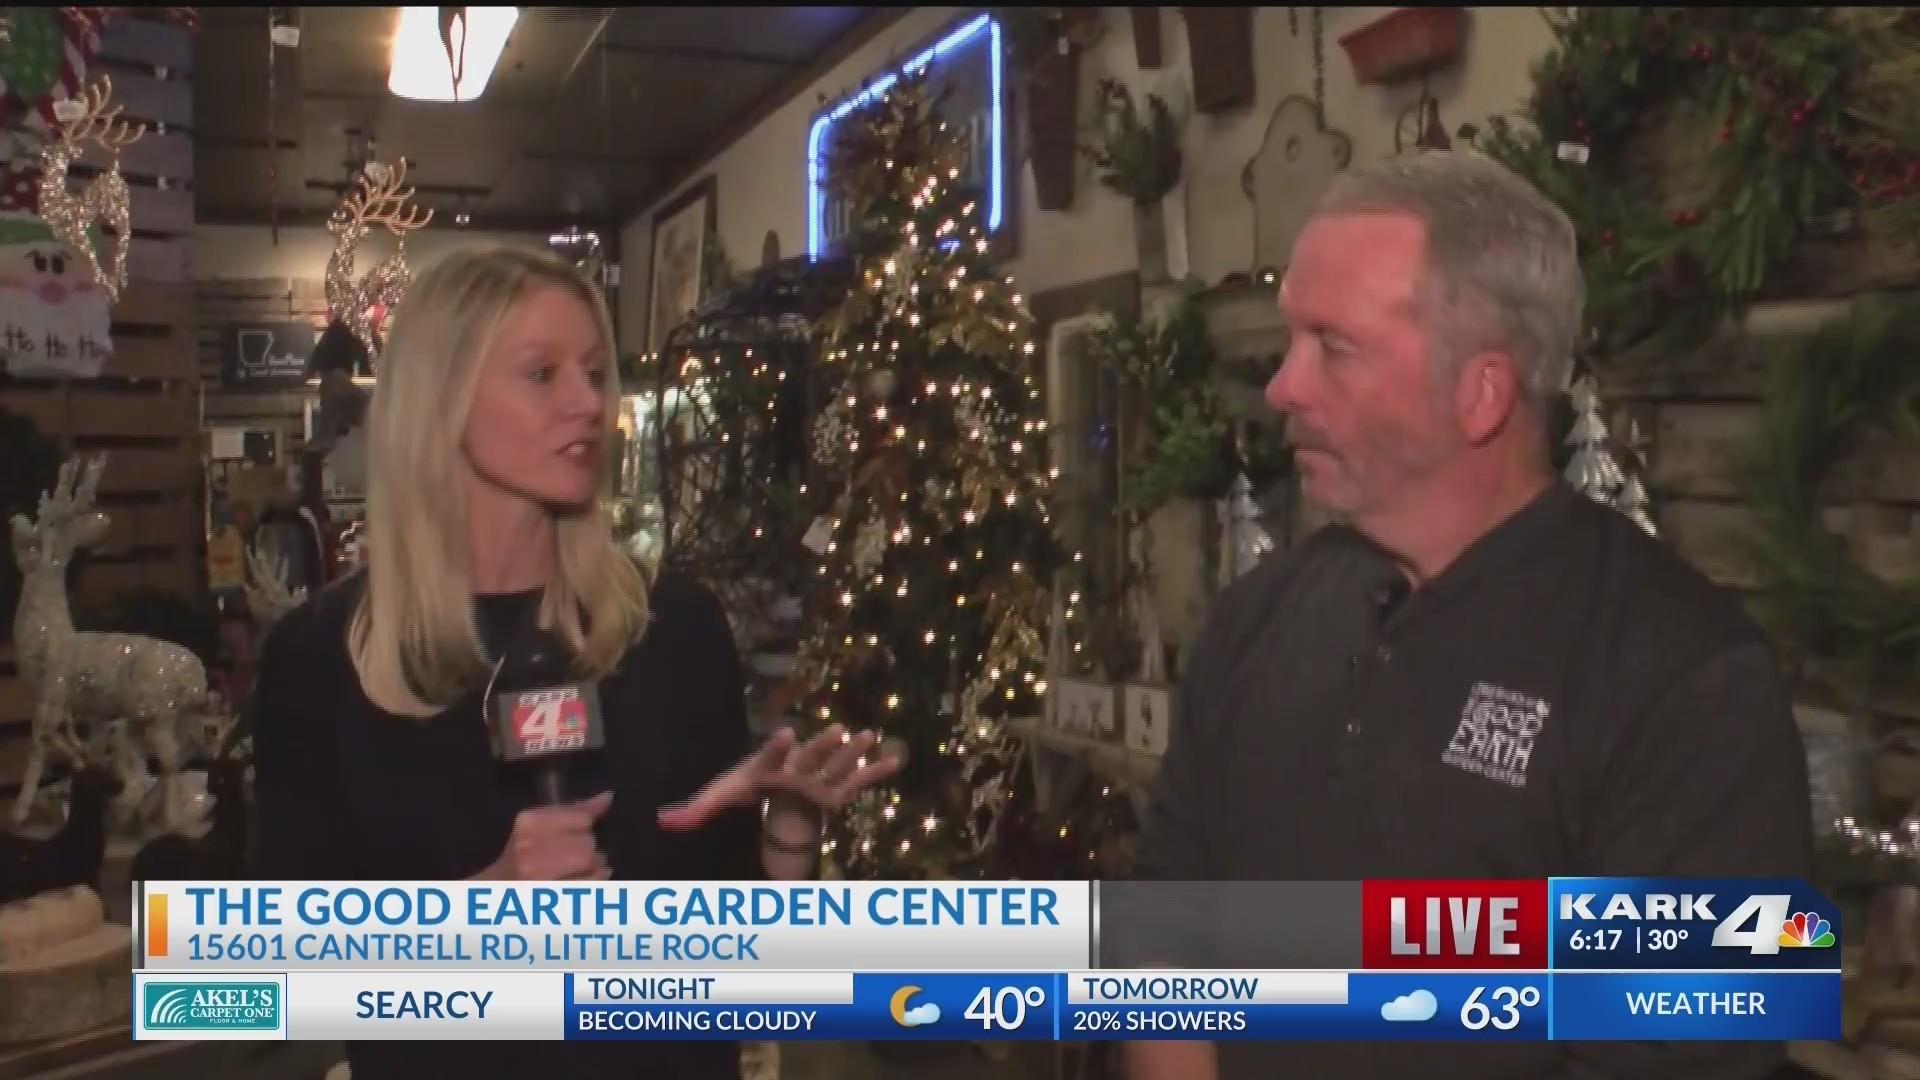 Good Earth: Christmas Decorations